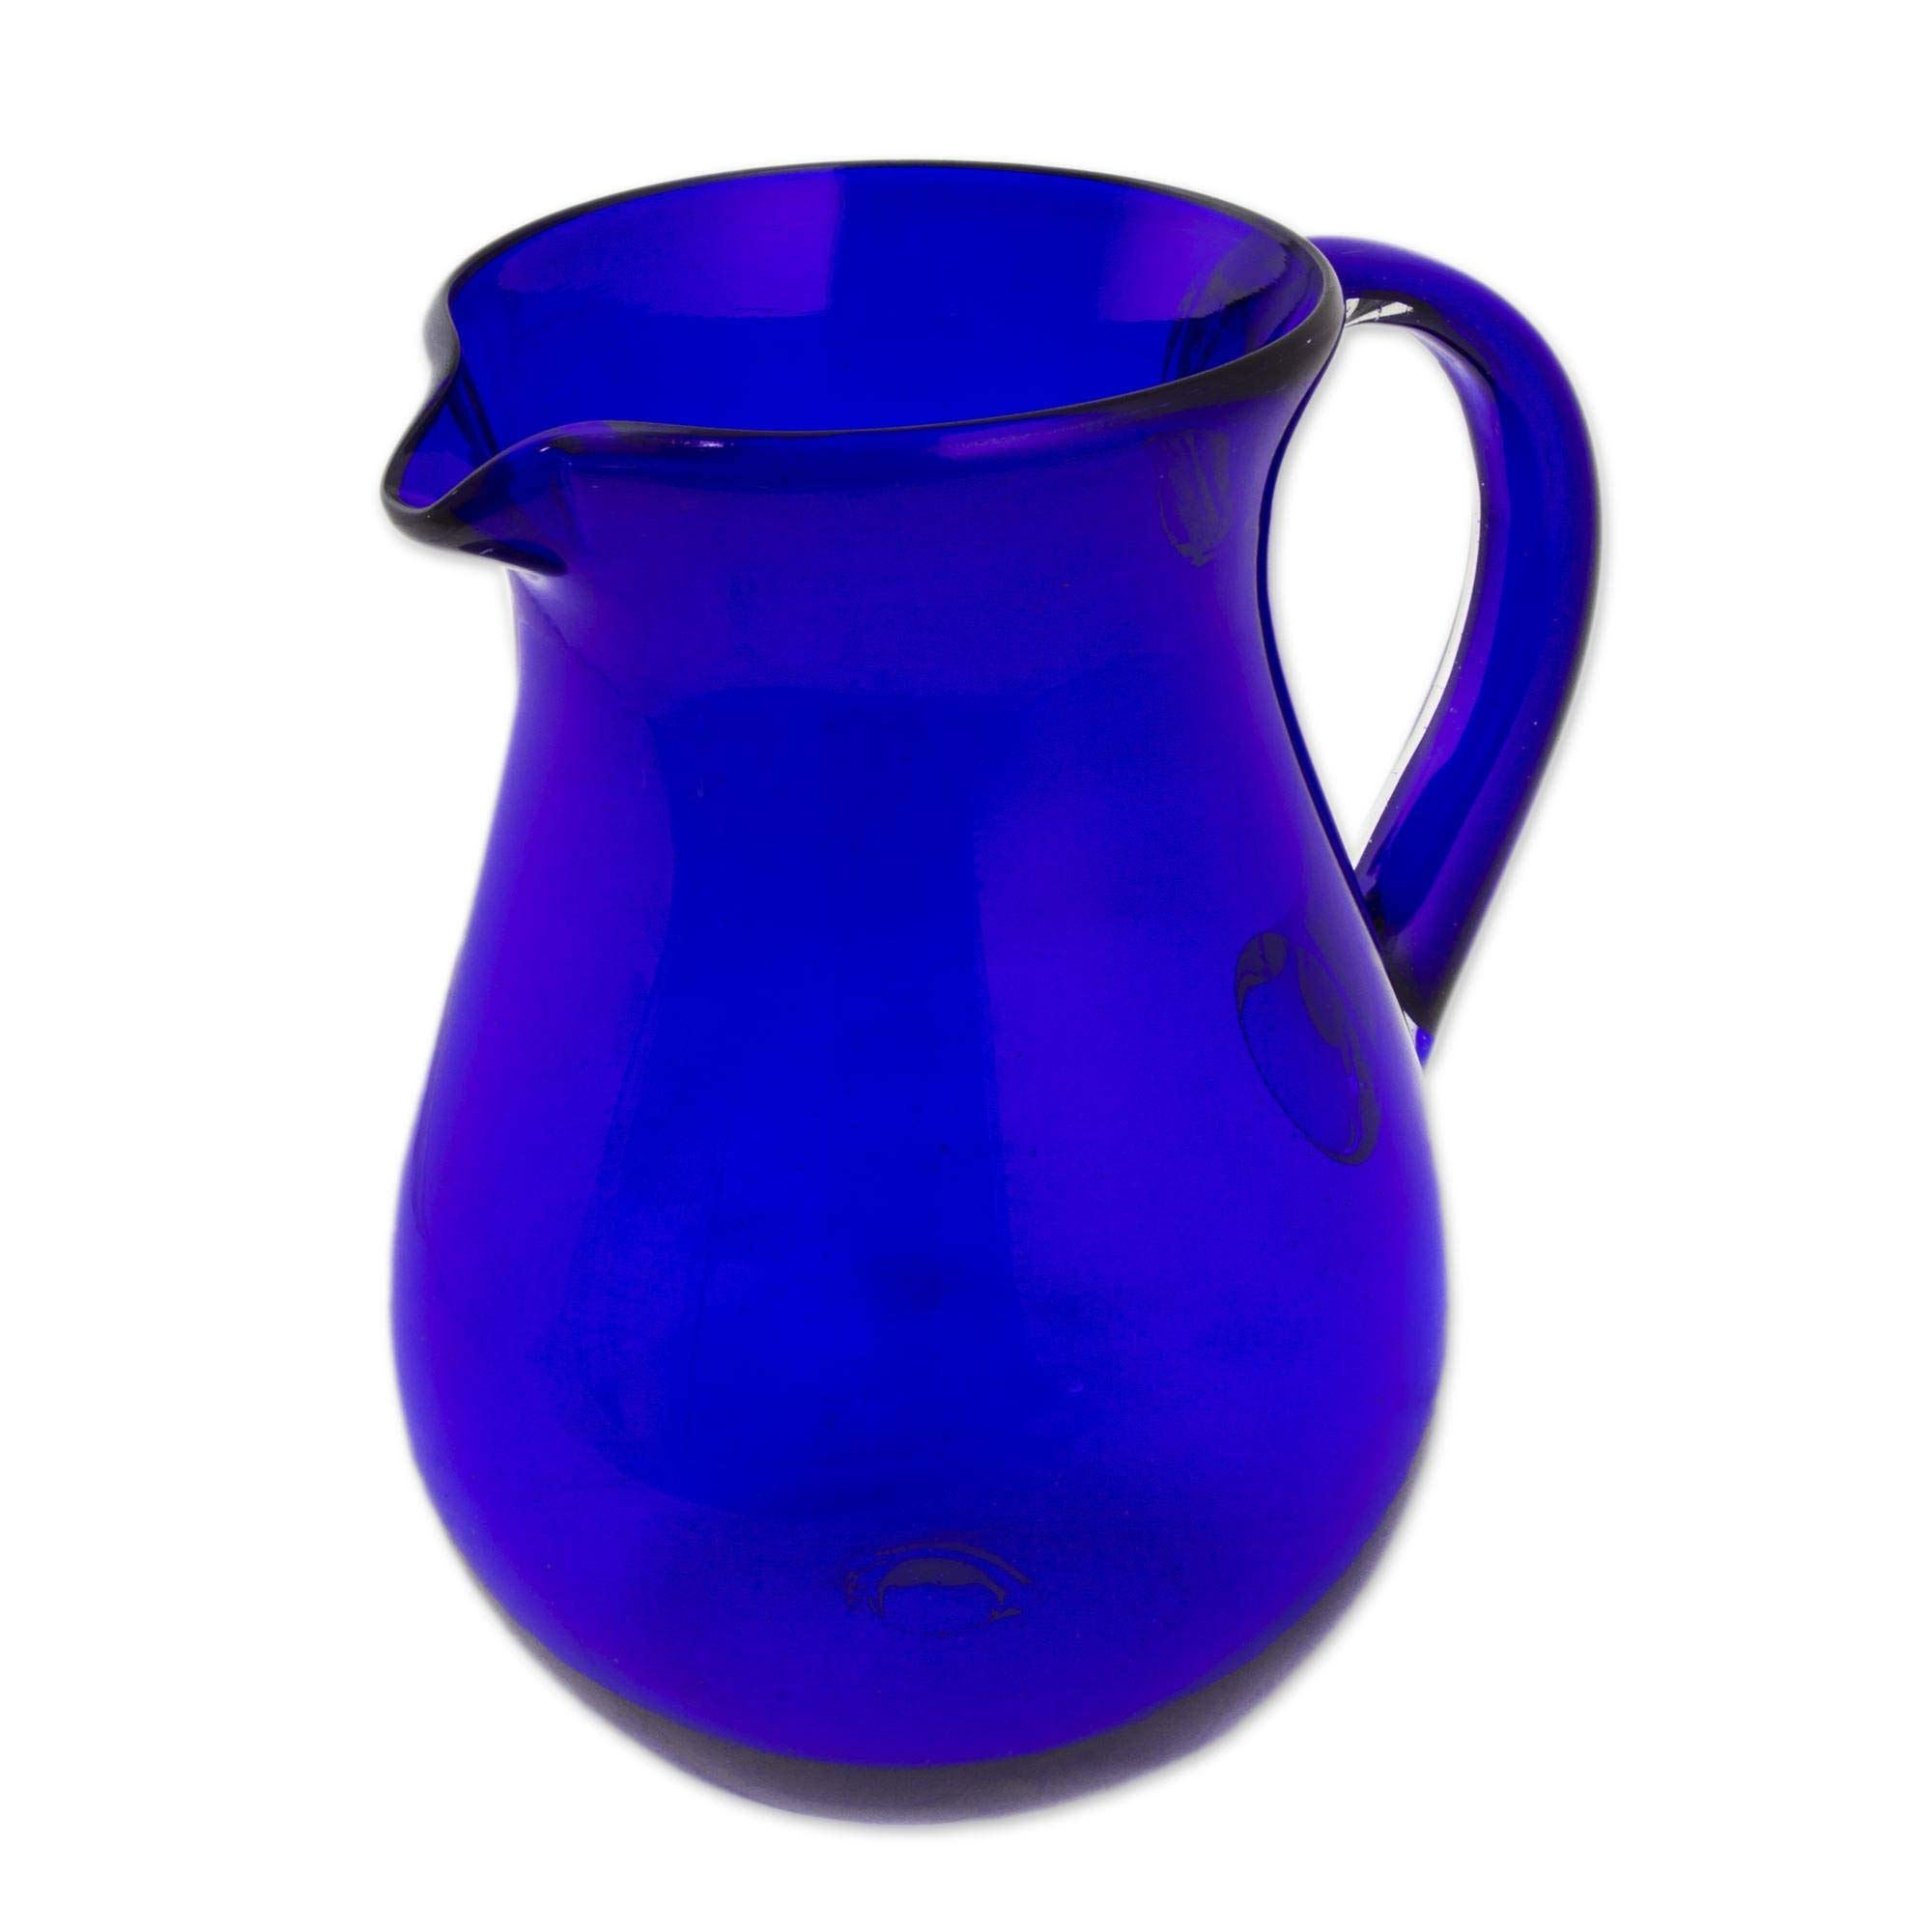 NOVICA Large Blue Hand Blown Glass Pitcher for Water, Margaritas, Lemonade, 82 oz, 'Cobalt Charm' by NOVICA (Image #3)